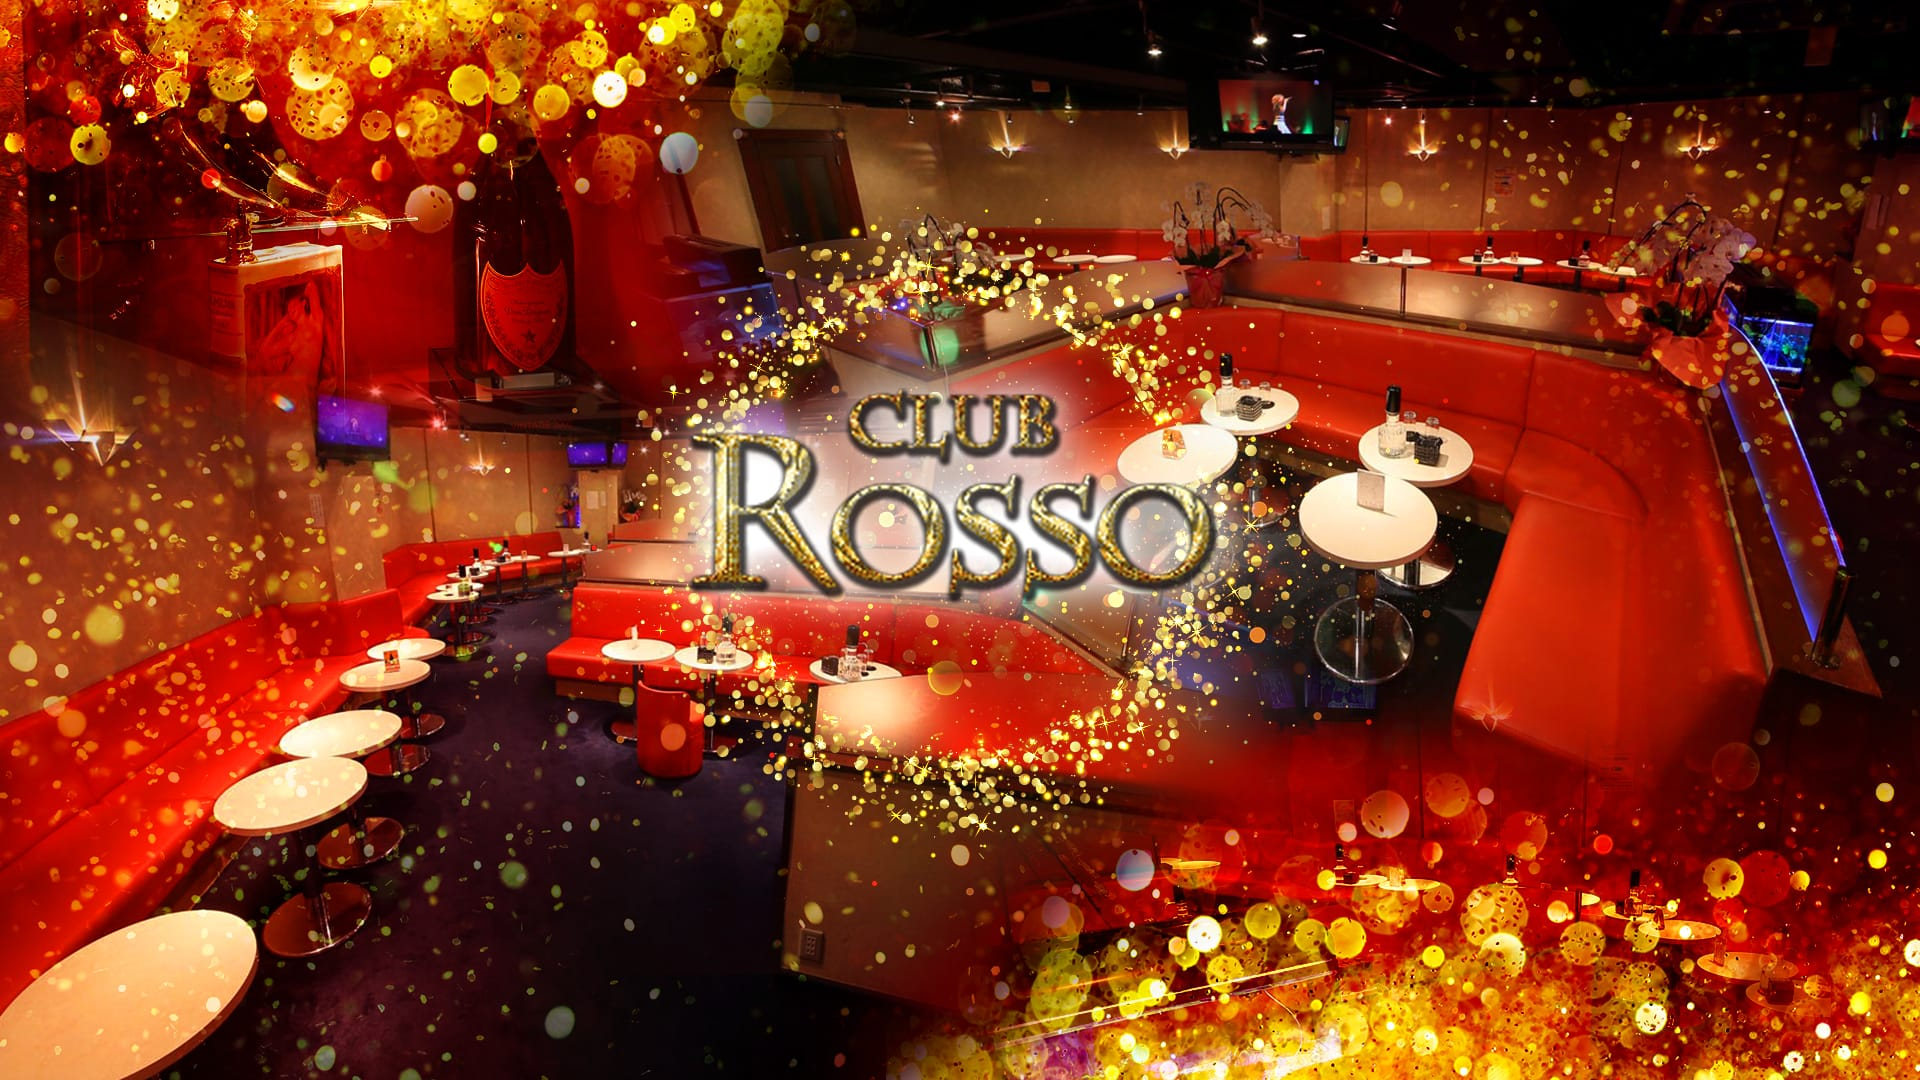 CLUB ROSSO [クラブ ロッソ] 川崎 キャバクラ TOP画像